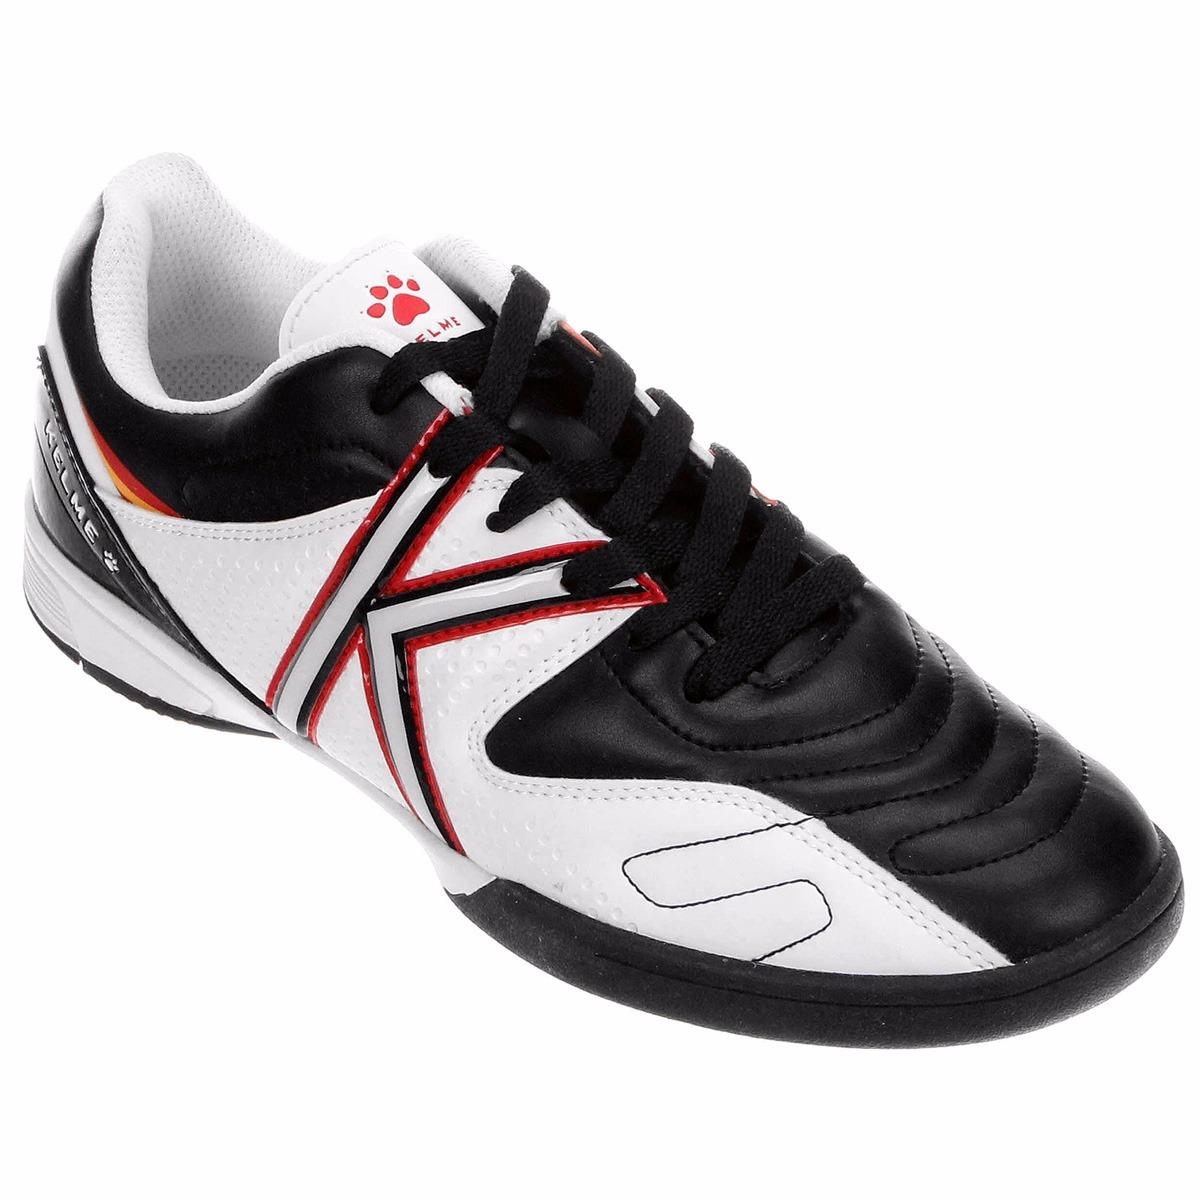 d5fa7db0e930b Chuteira Kelme Futsal Original Infantil Preto branco + Nf - R  129 ...